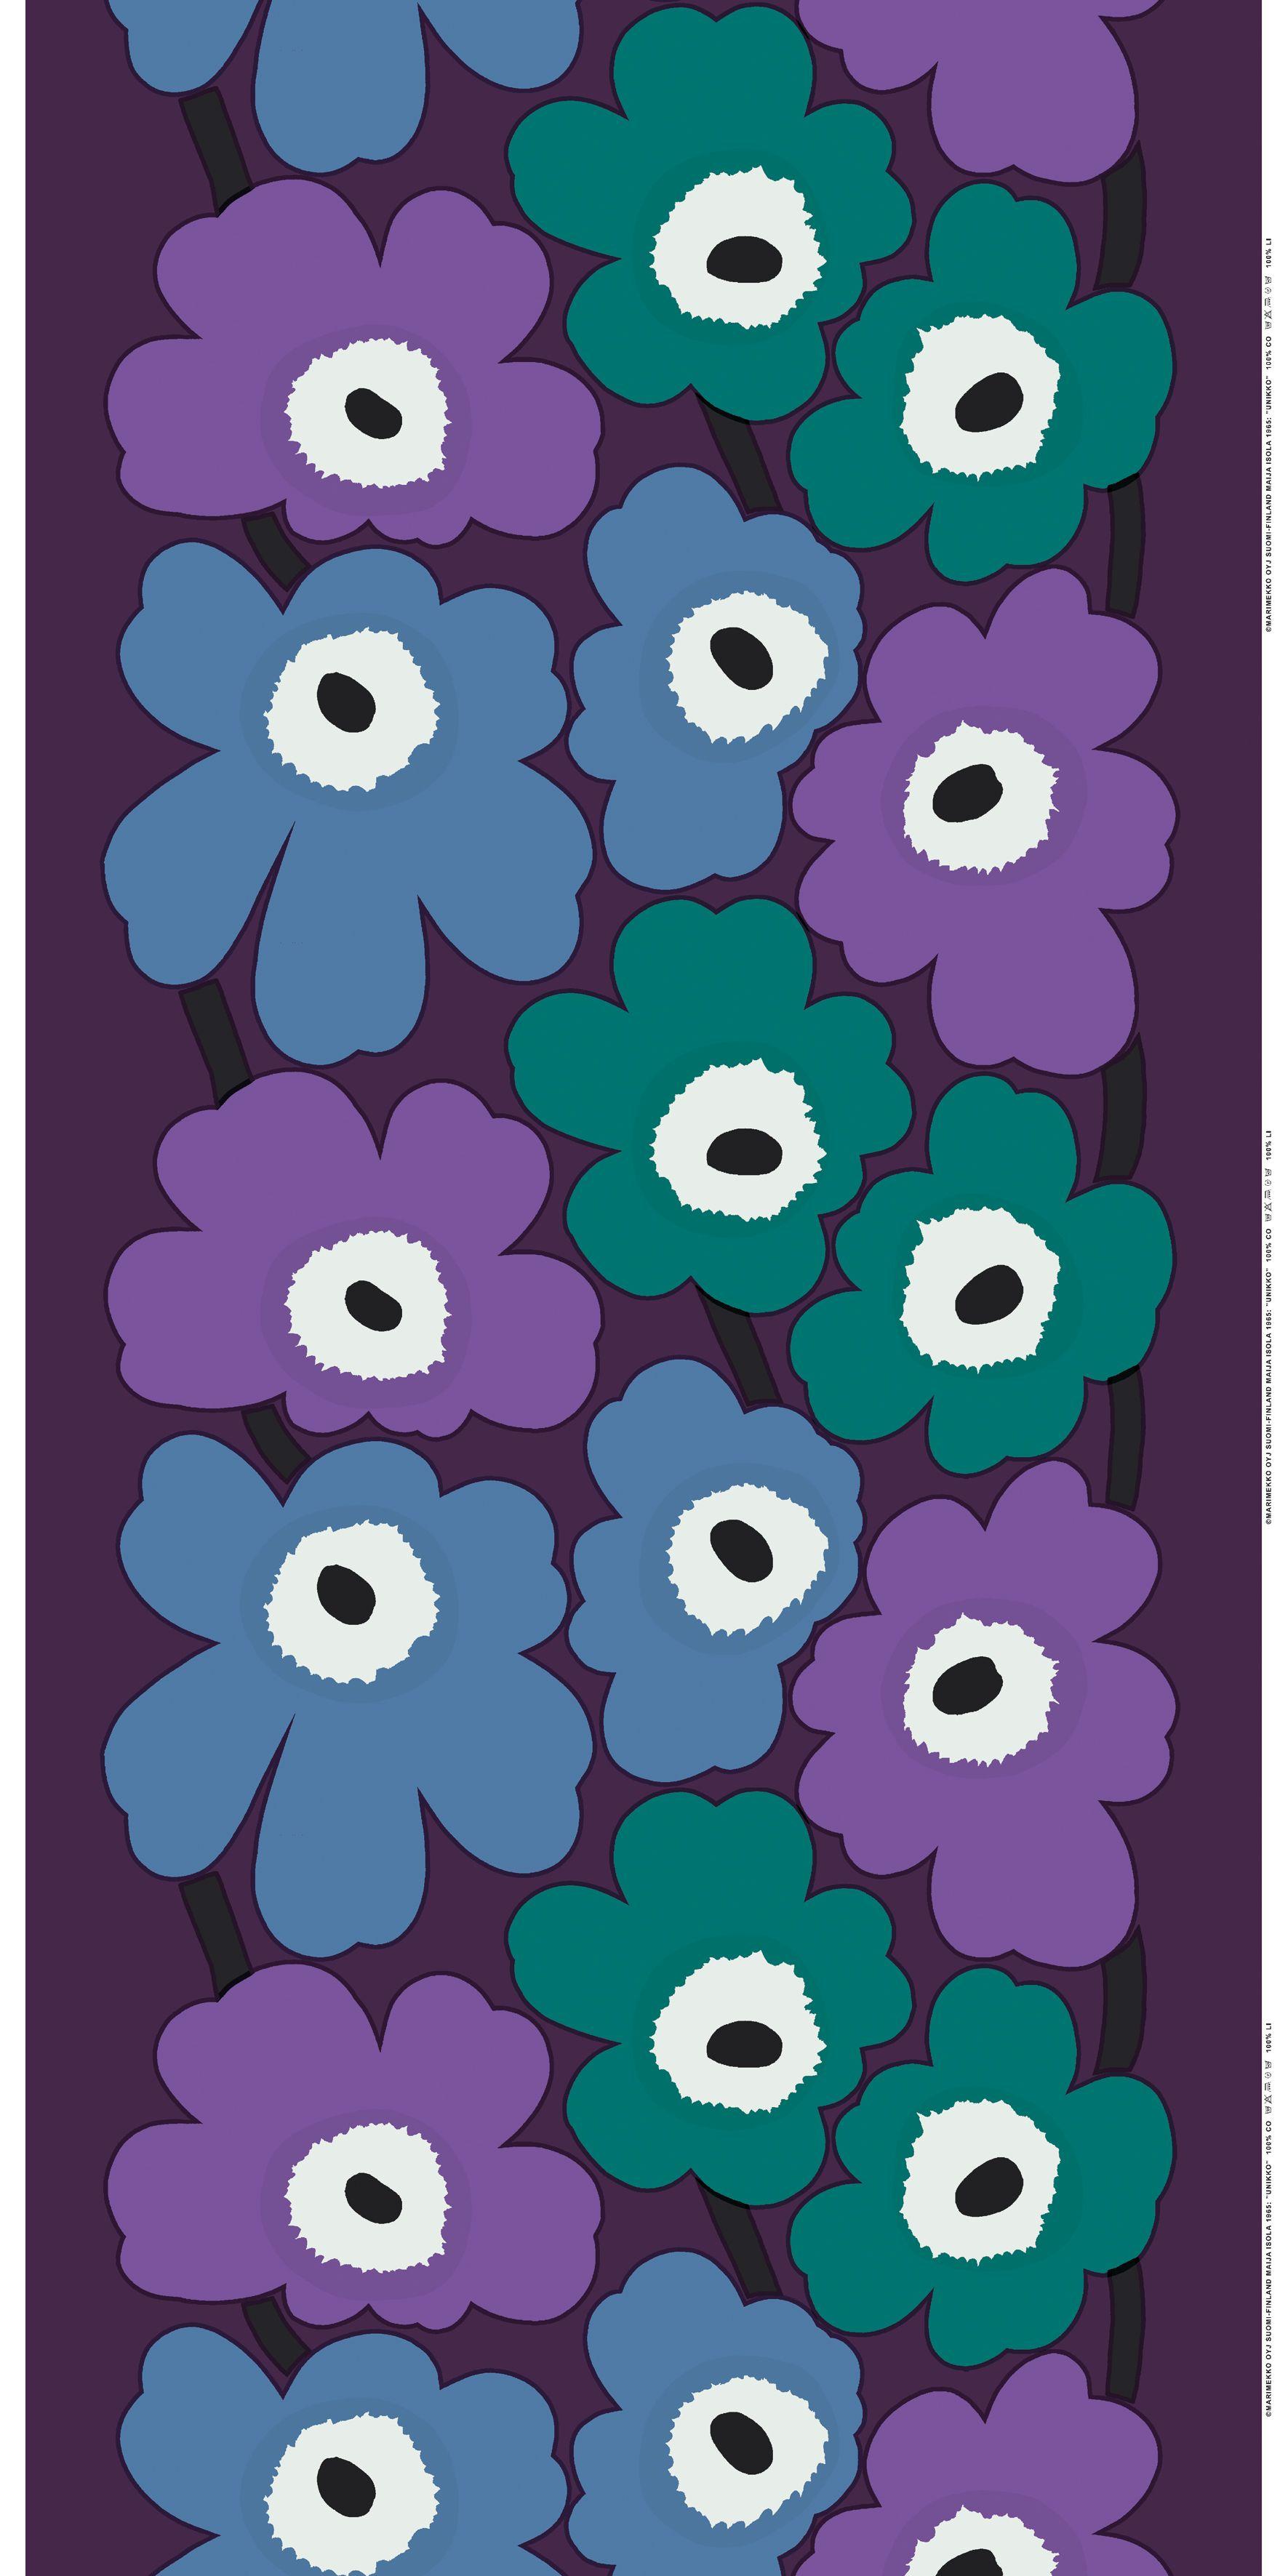 unikko pattern blue black multi design marimekko pinterest marimekko marimekko fabric. Black Bedroom Furniture Sets. Home Design Ideas